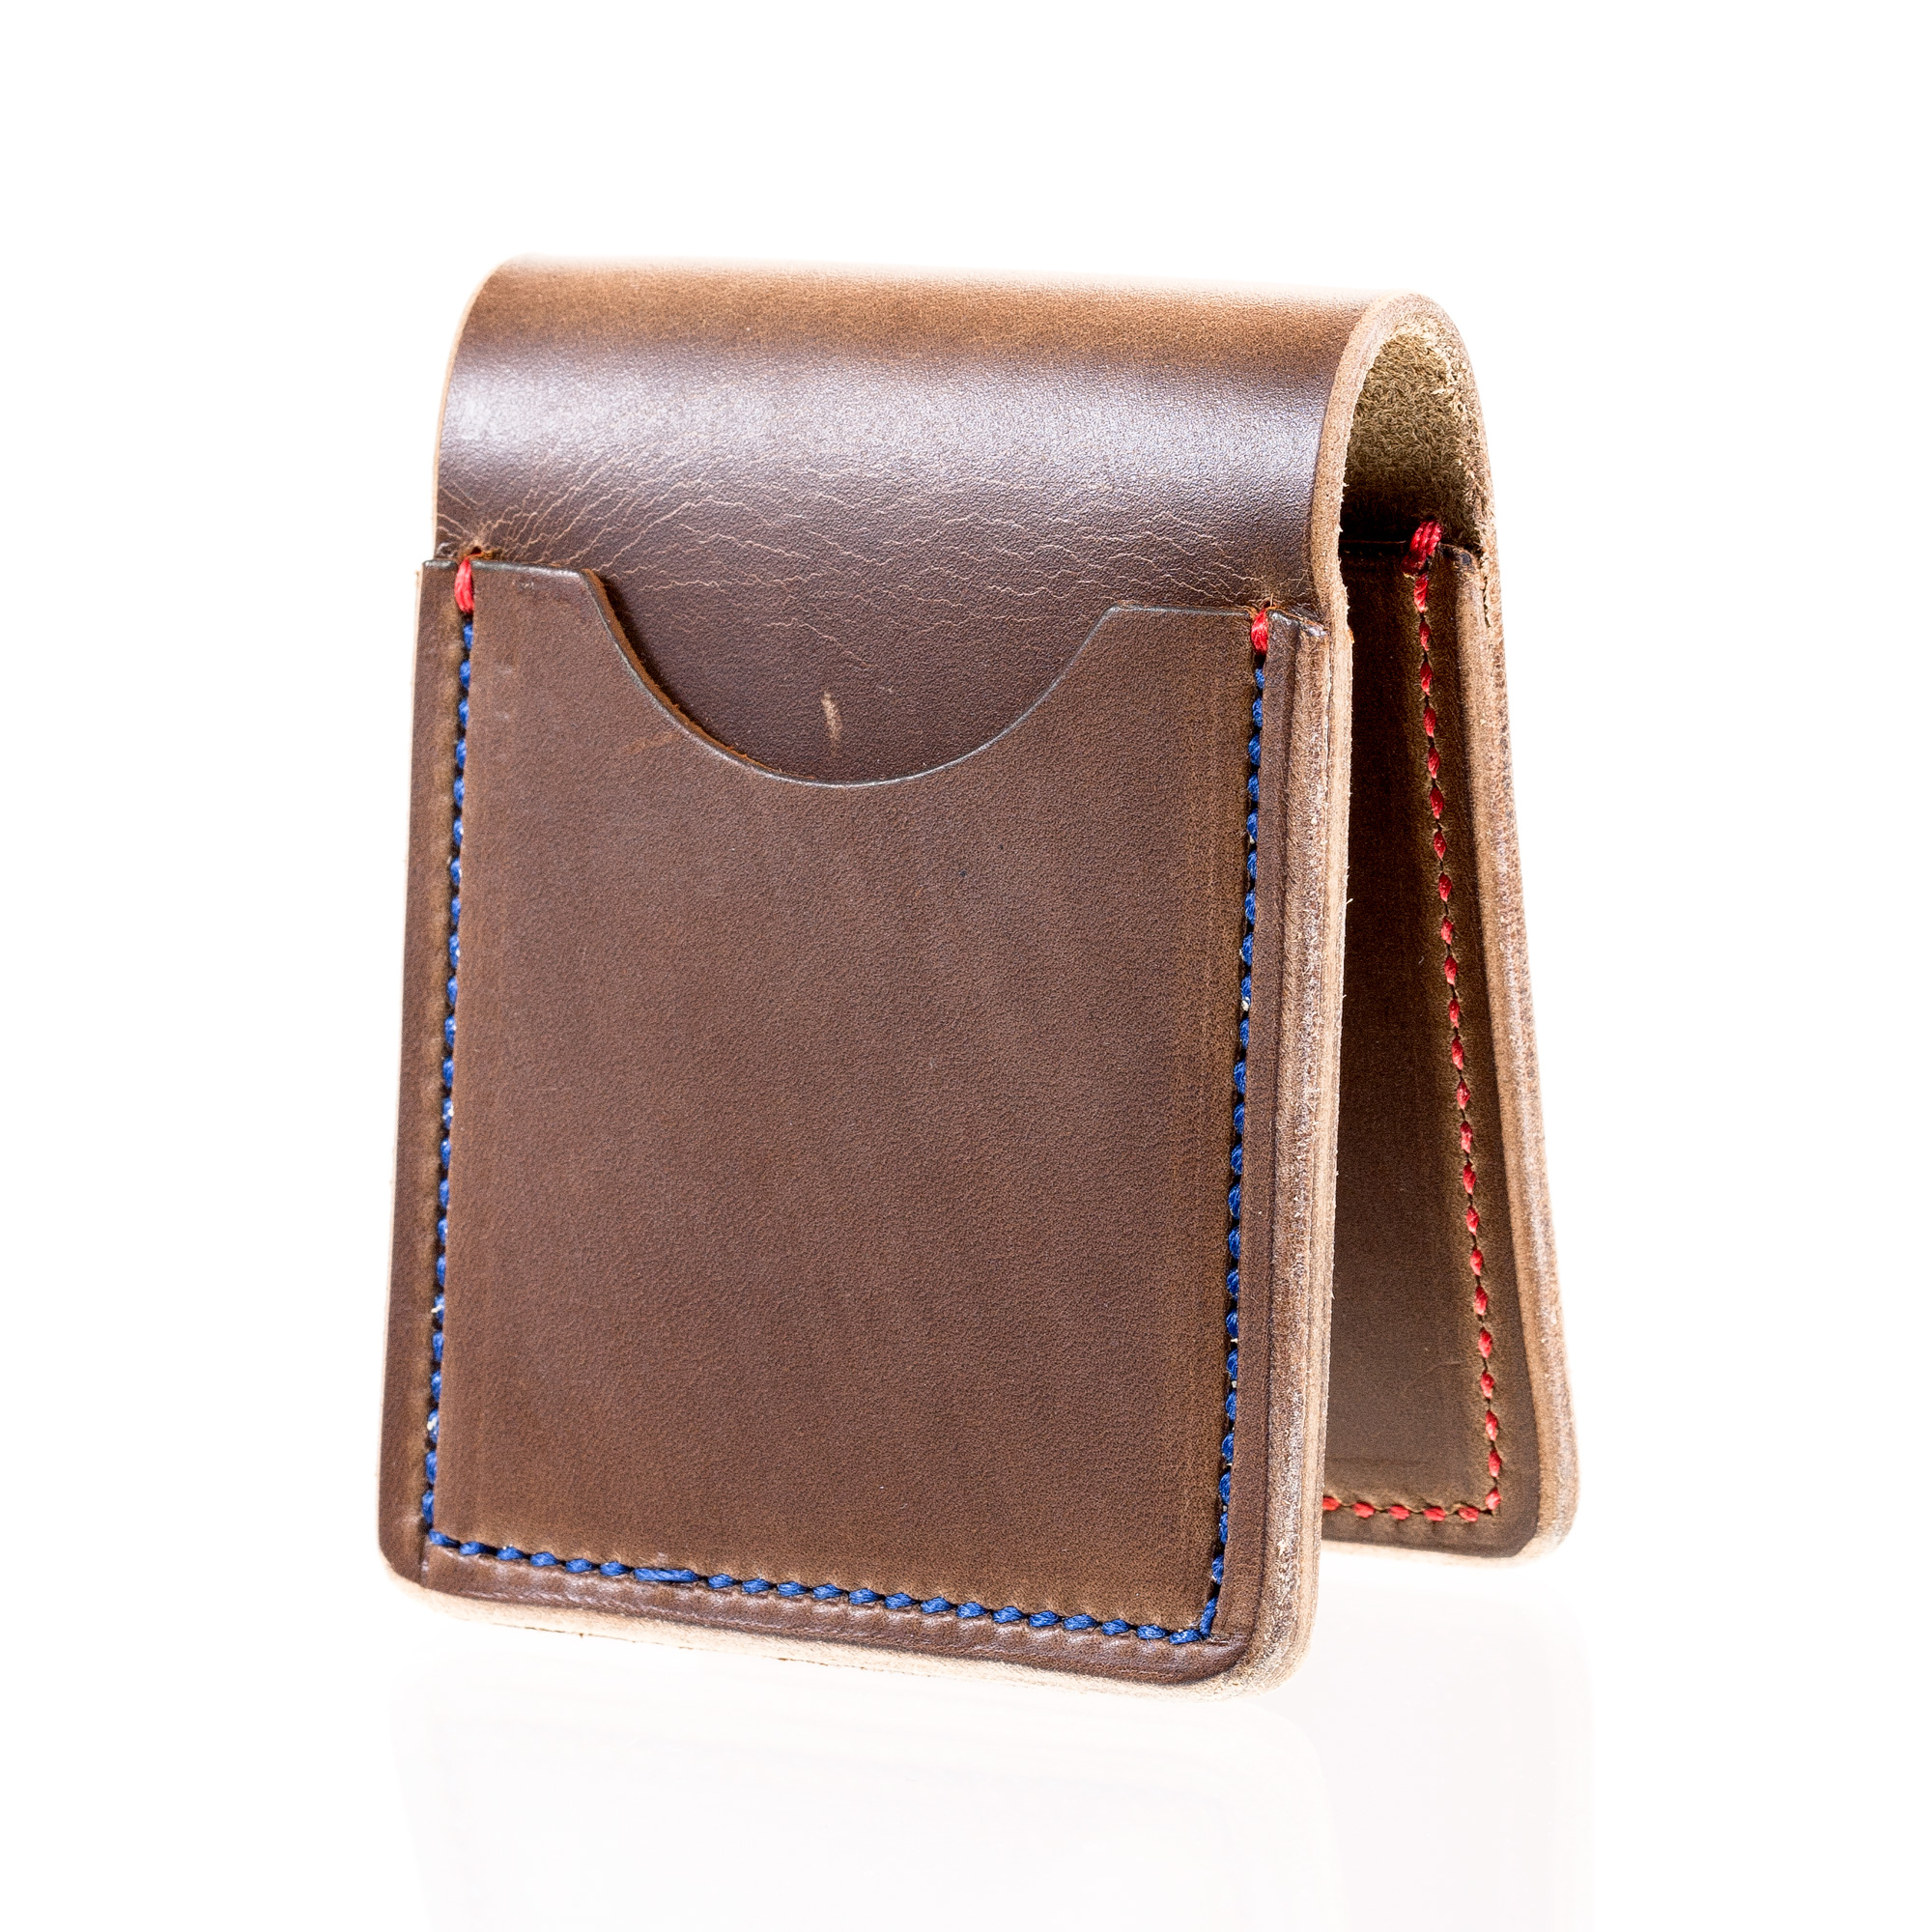 Benjamin's Pocket Guardrail Horween Chromexcel Natural Horse Leather Wallet